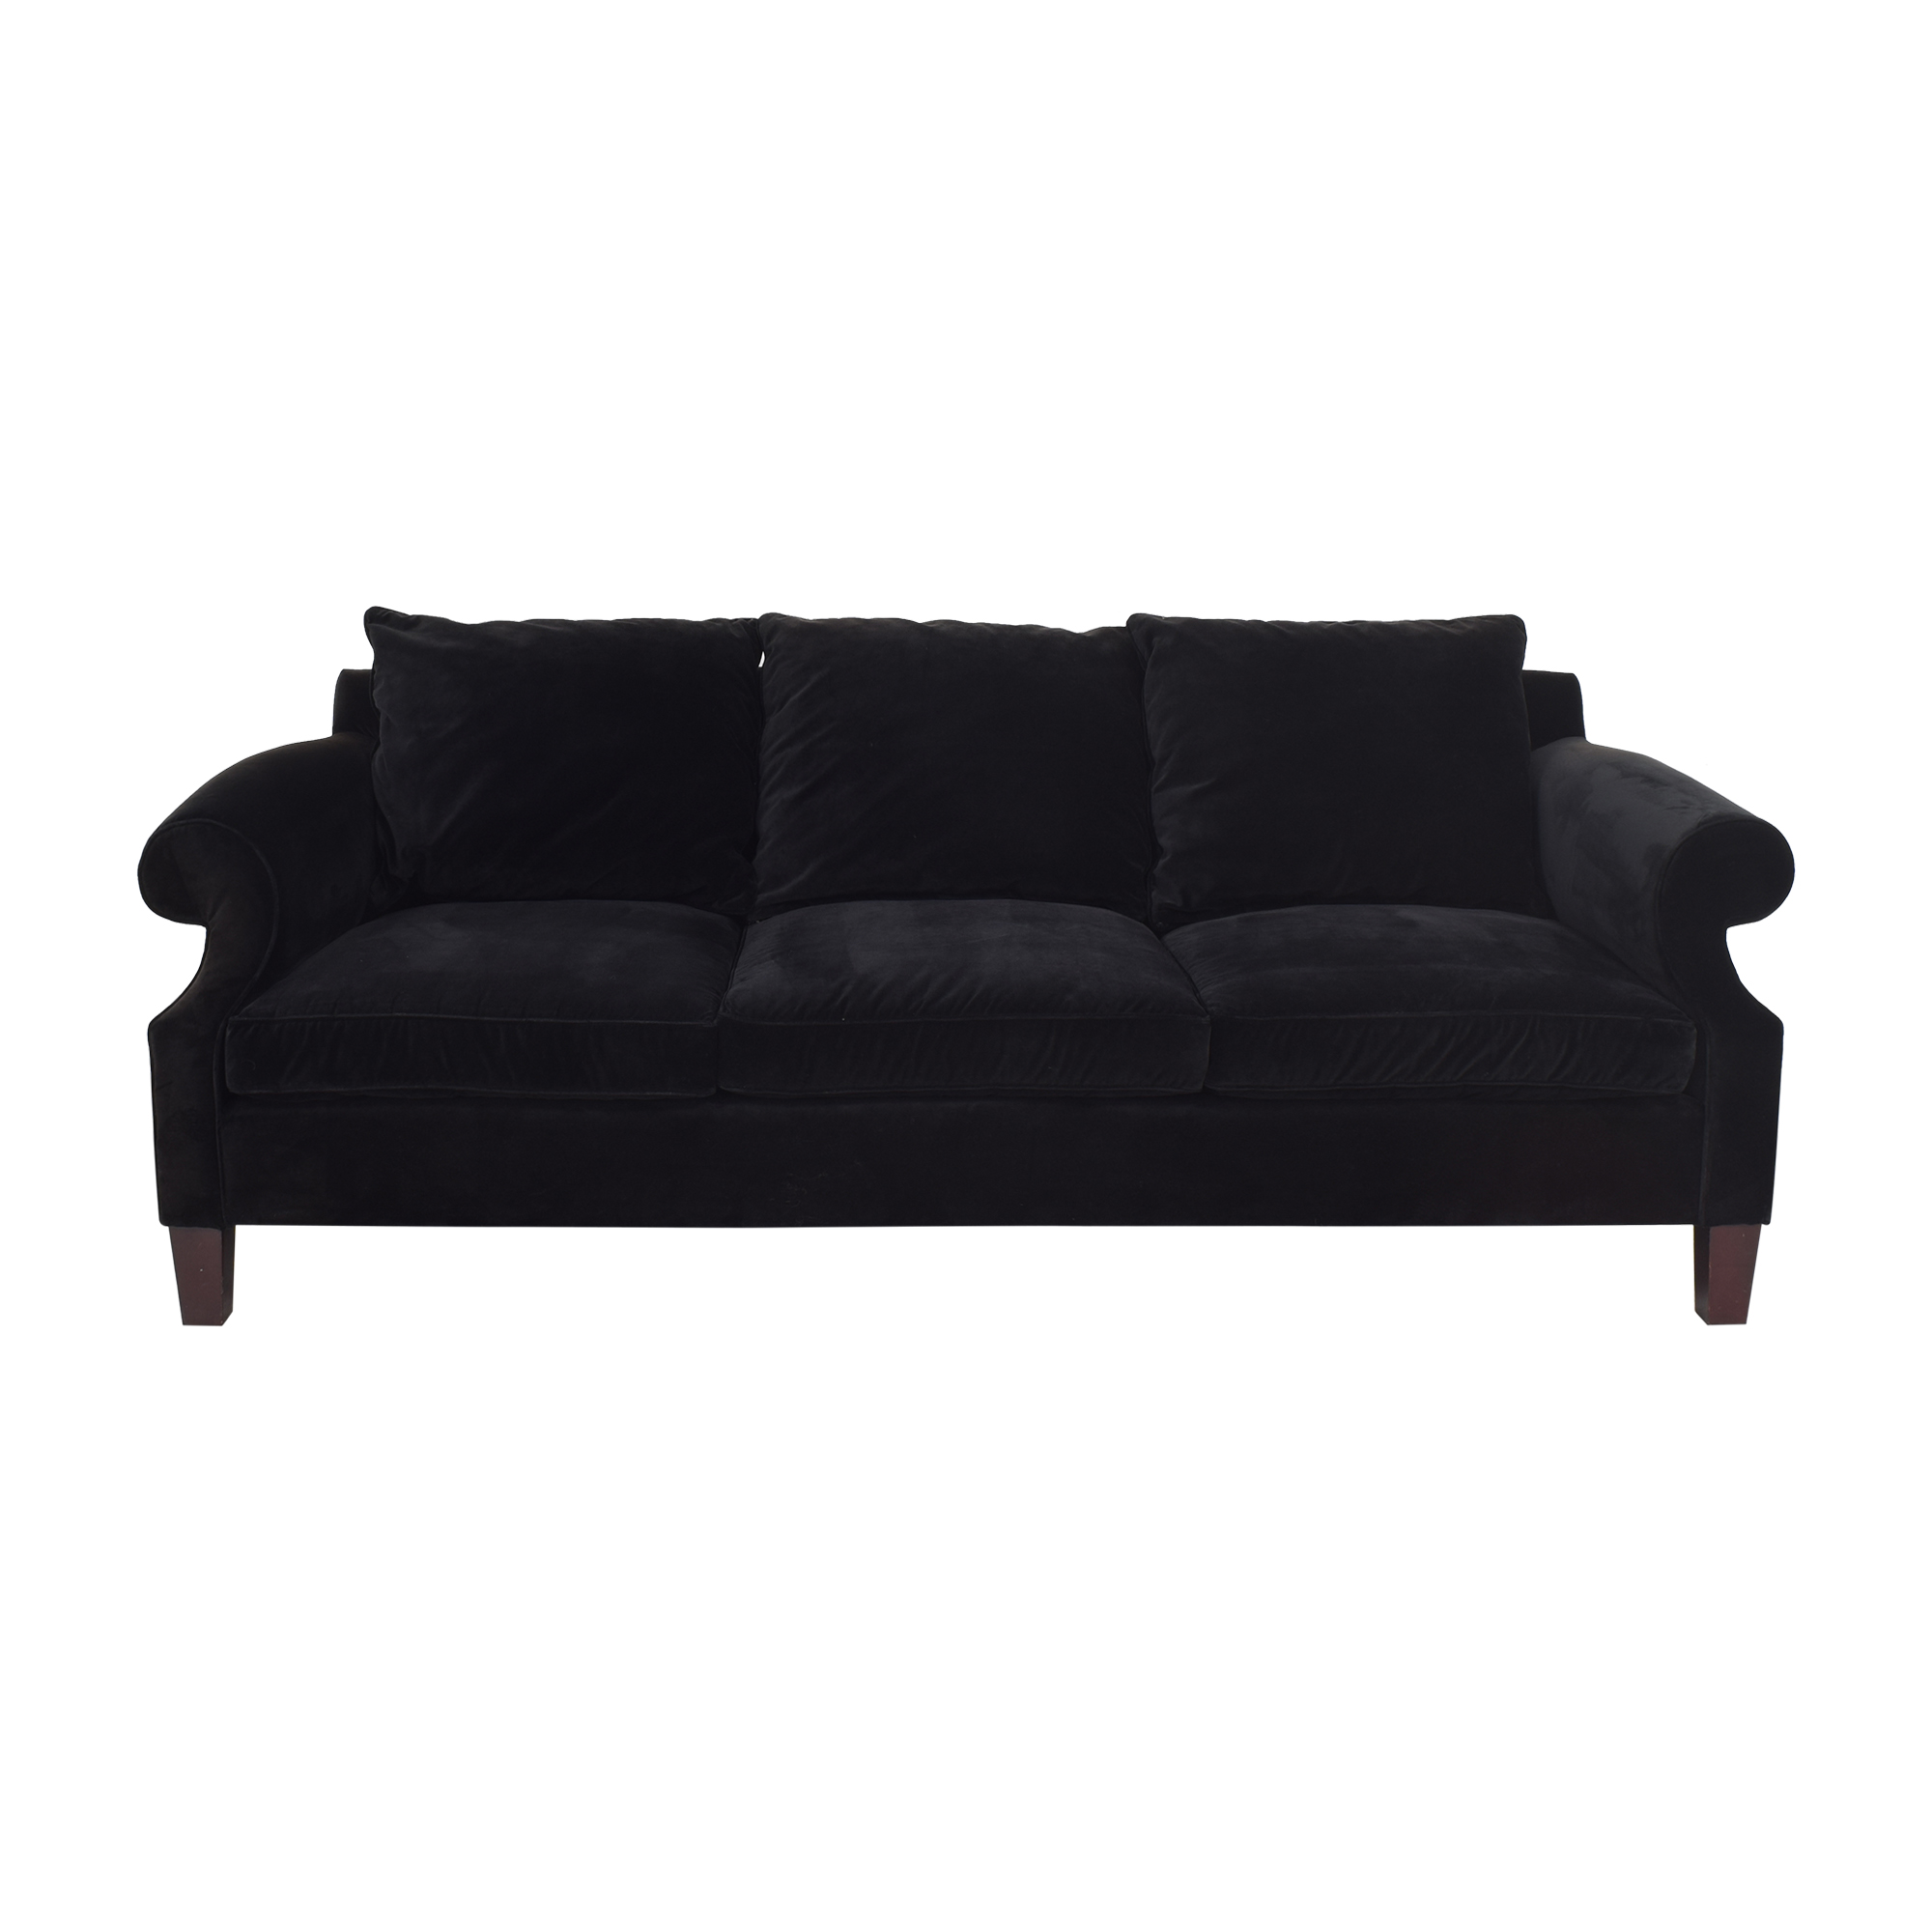 Ralph Lauren Home Roll Arm Sofa / Sofas